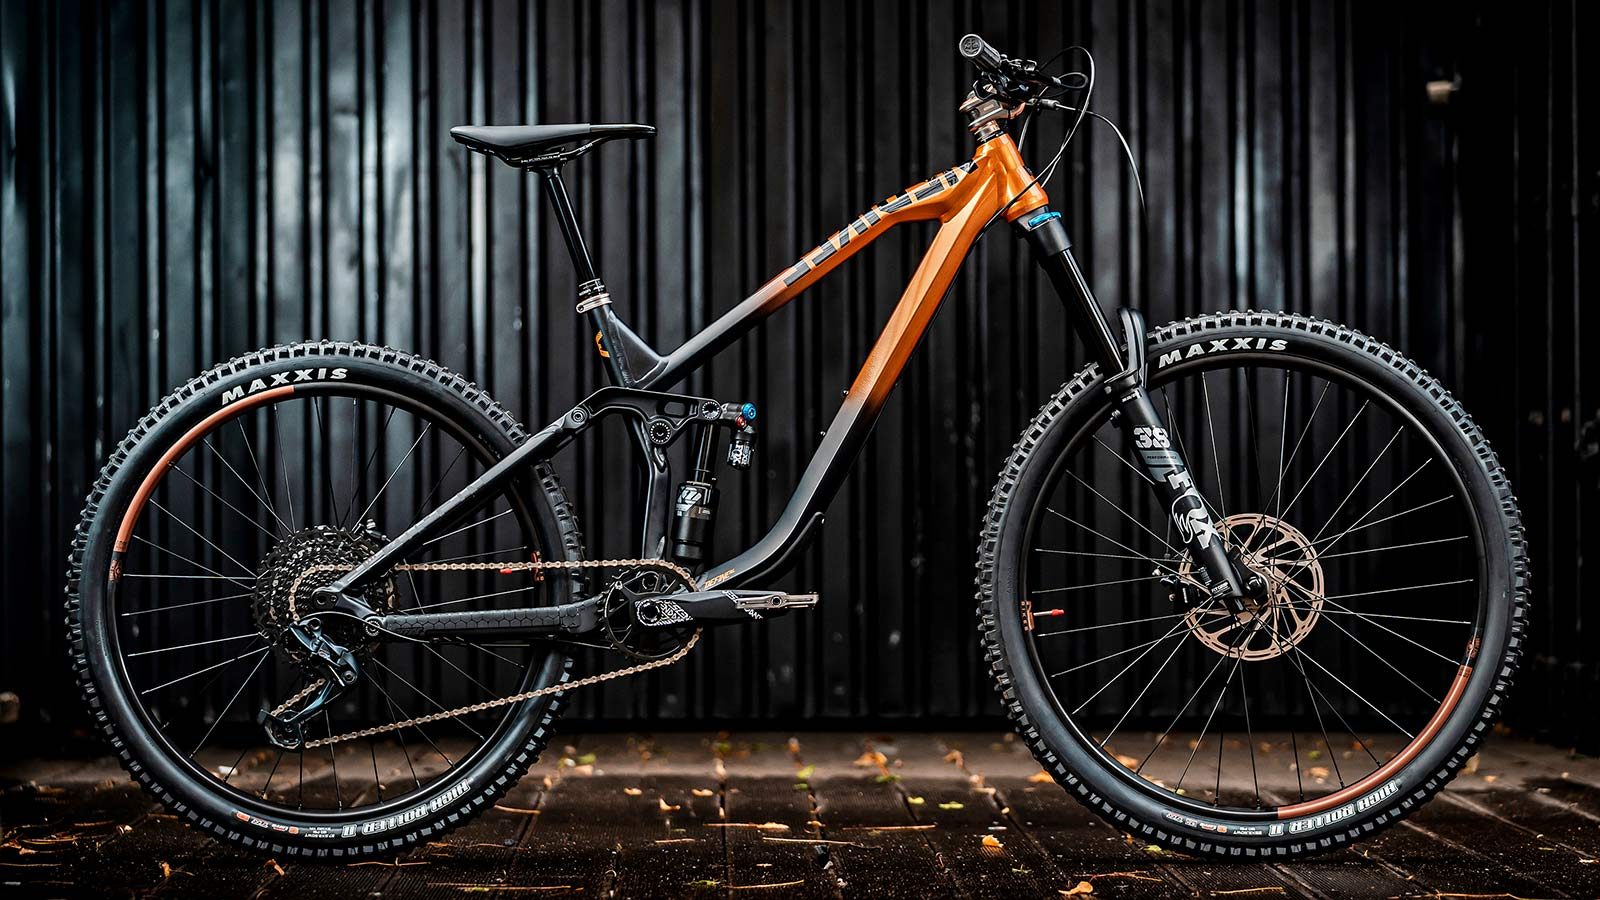 NS Bikes Define AL 170 long-travel mullet enduro plus all-mountain bike, photo by Piotr Jurczak, complete